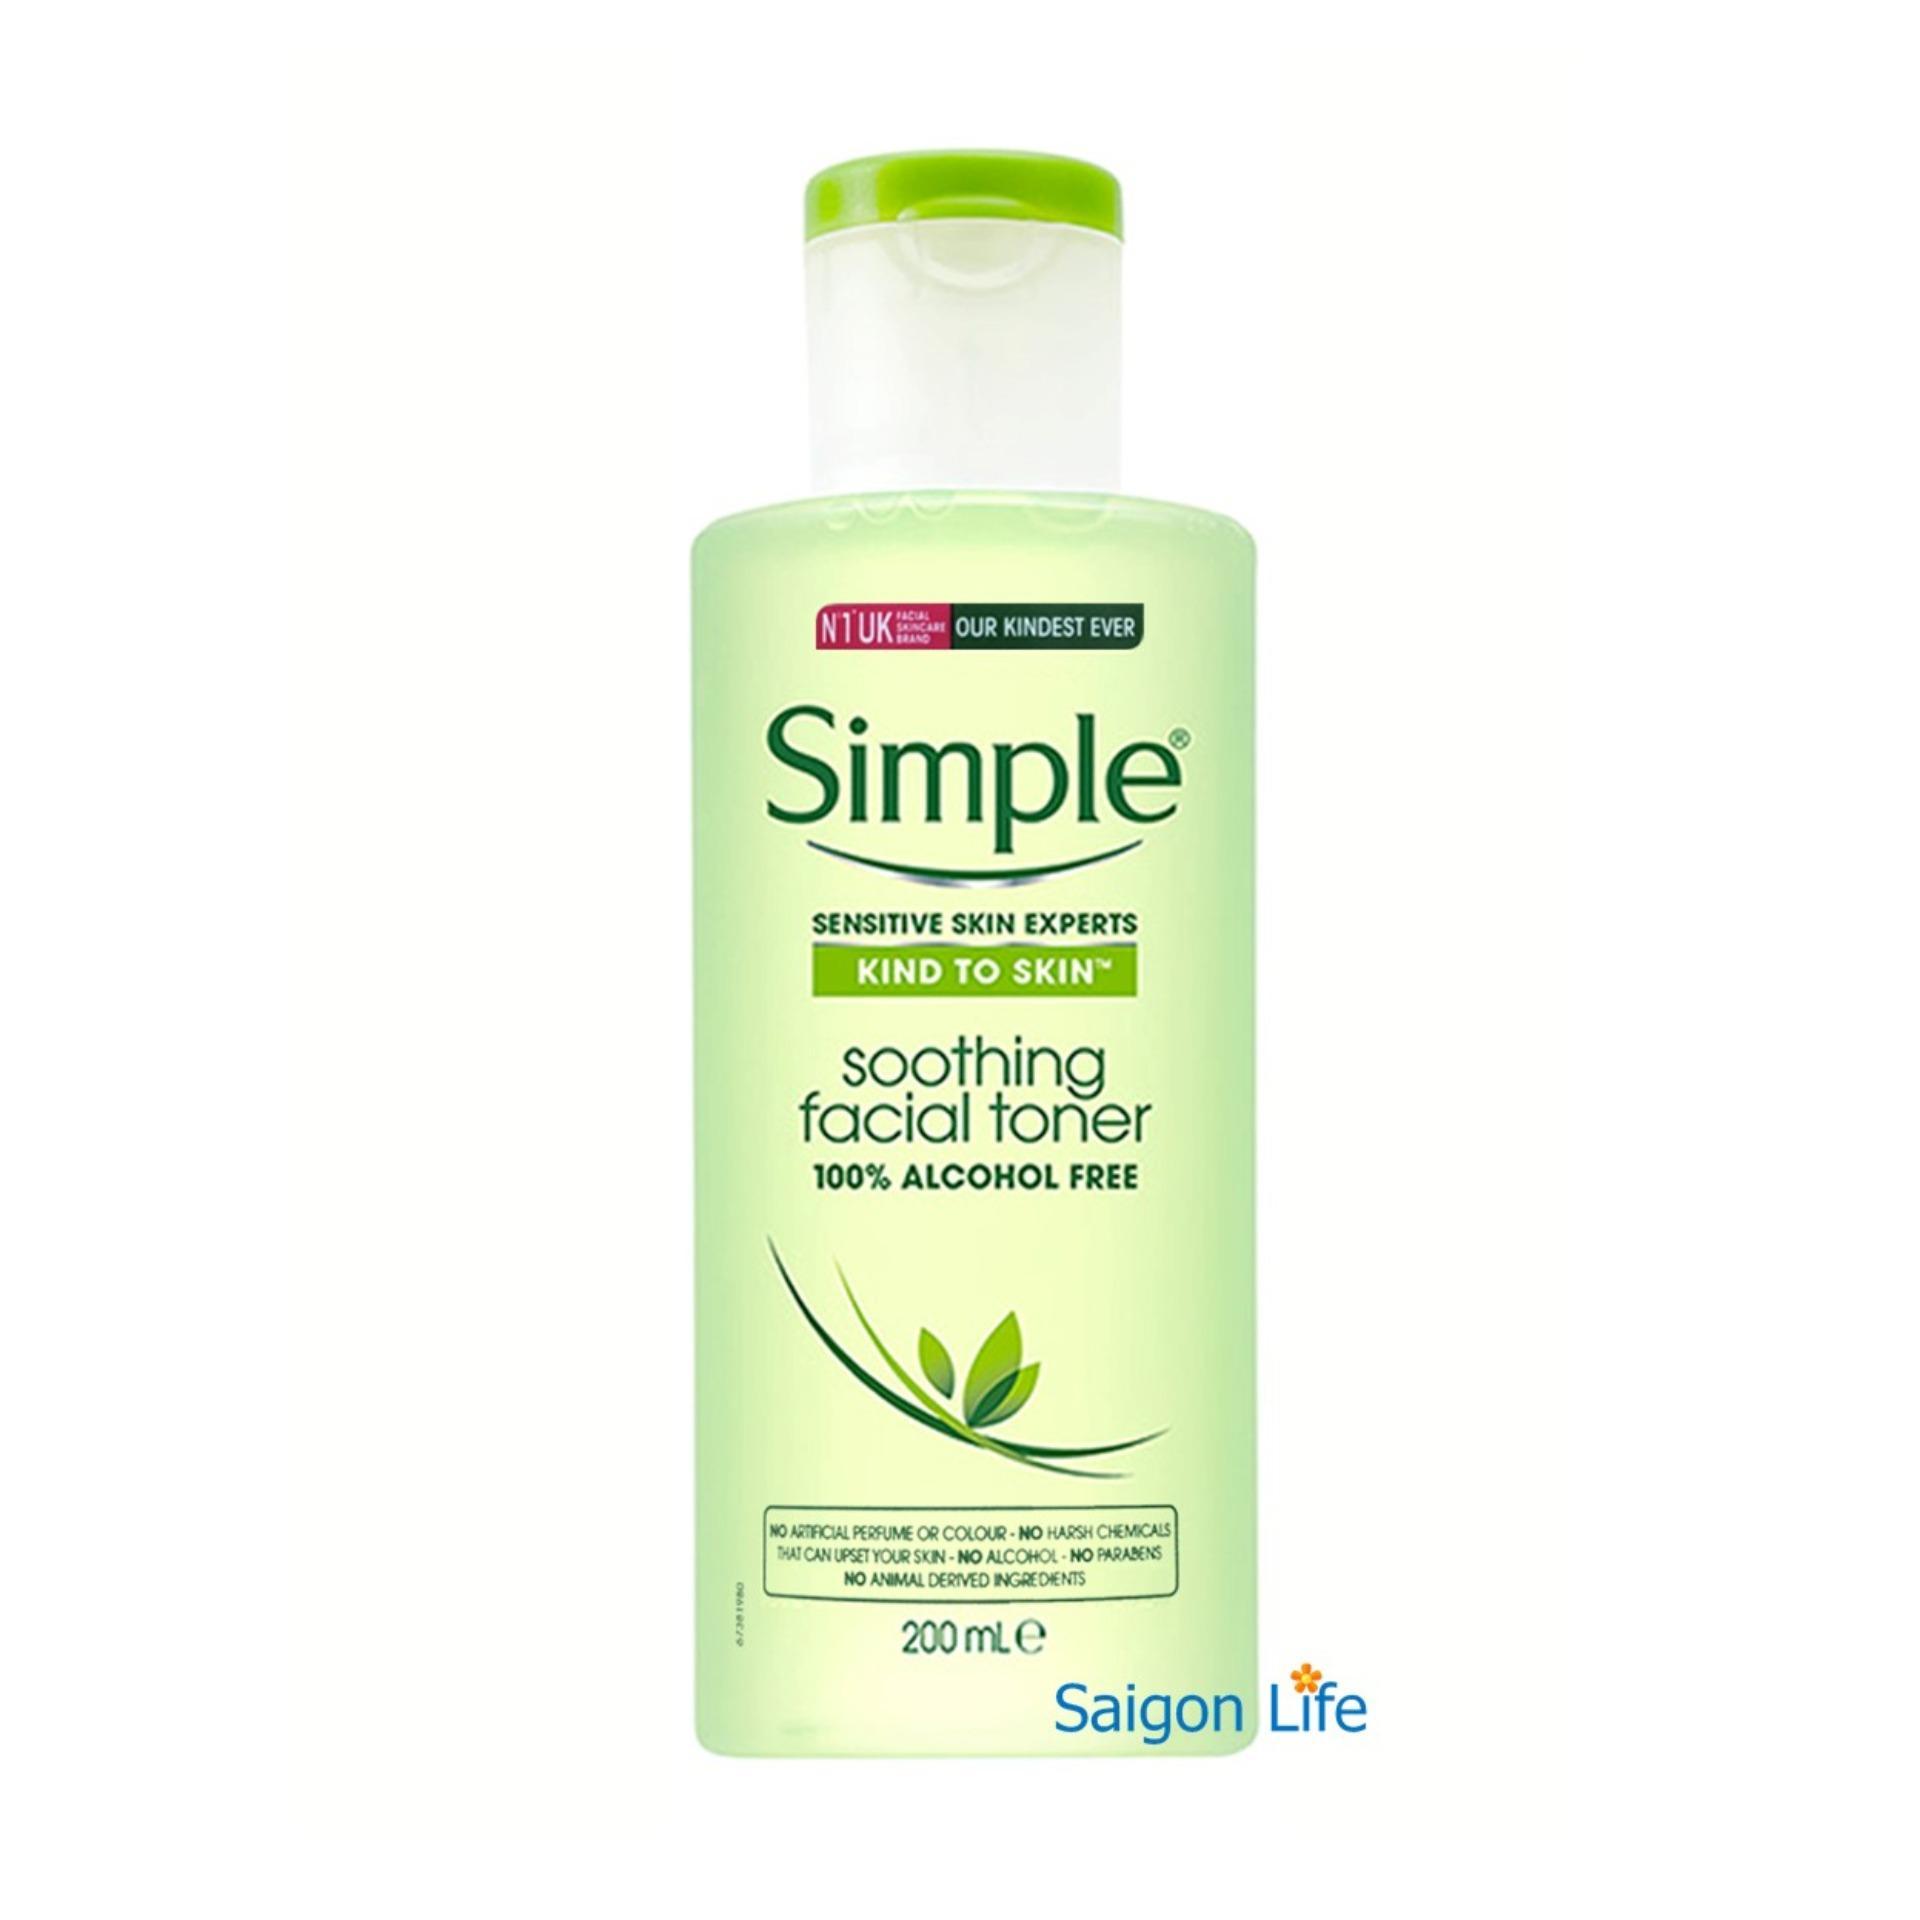 Nước hoa hồng Simple Kind To Skin Soothing Facial Toner 200ml (Mẫu mới) tốt nhất